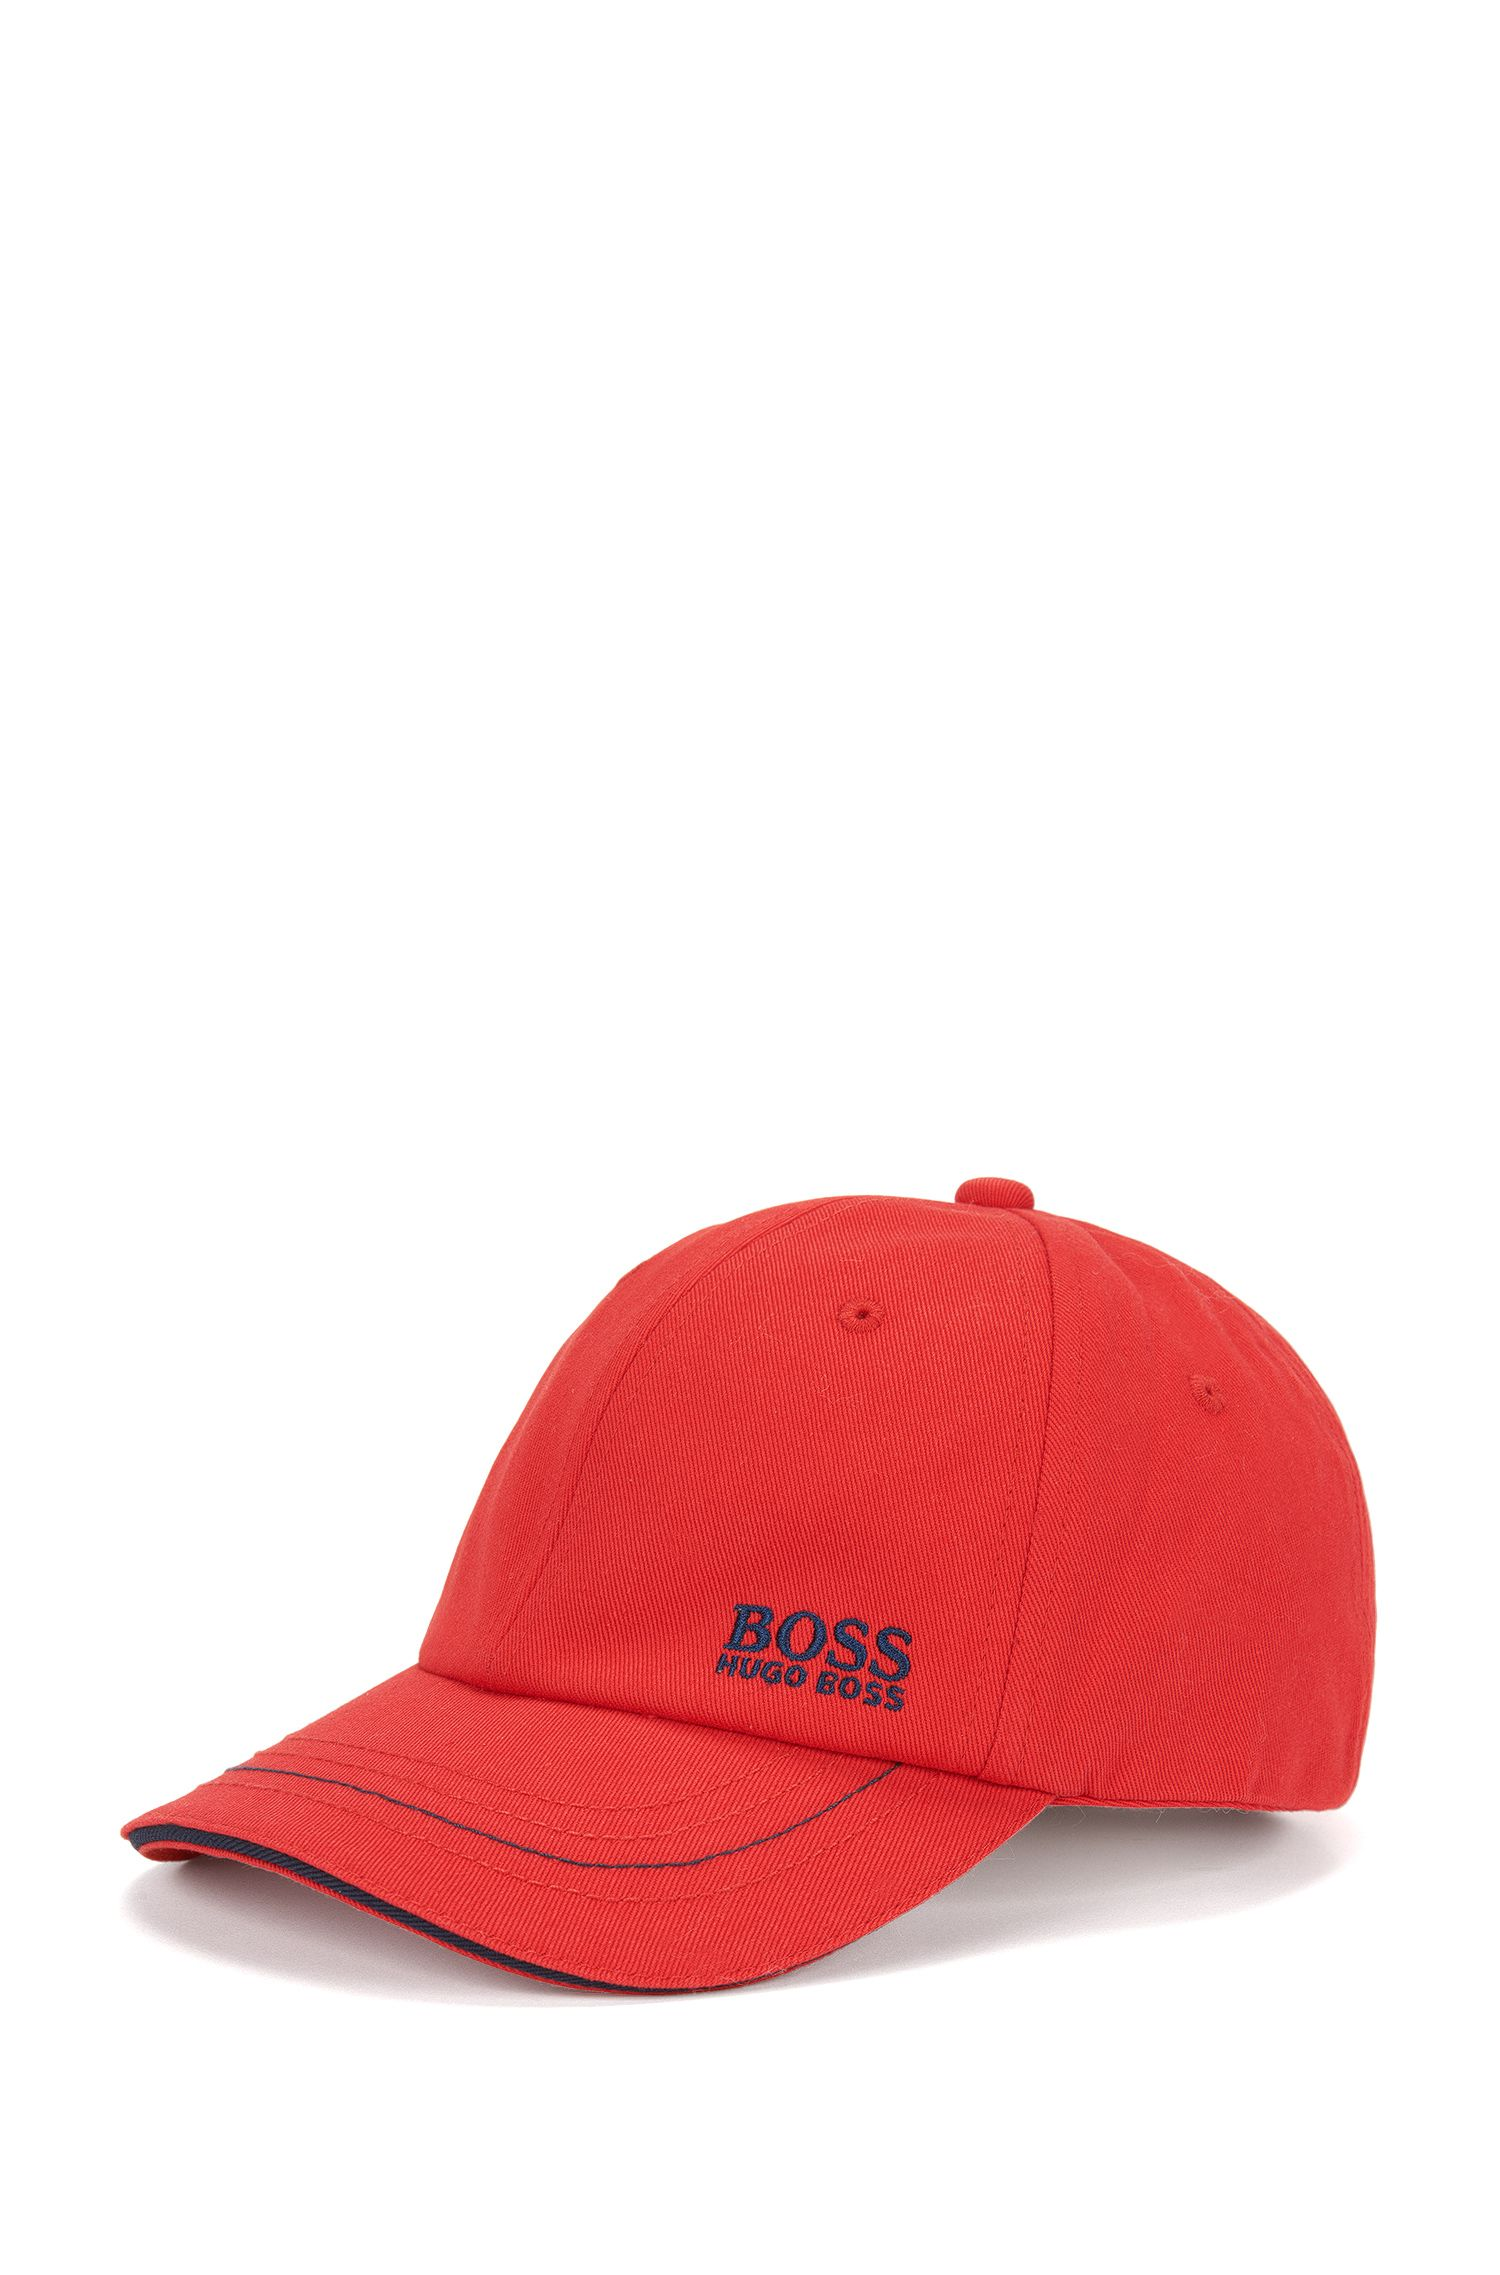 Kids' cap in cotton blend with logo lettering: 'J21U53'